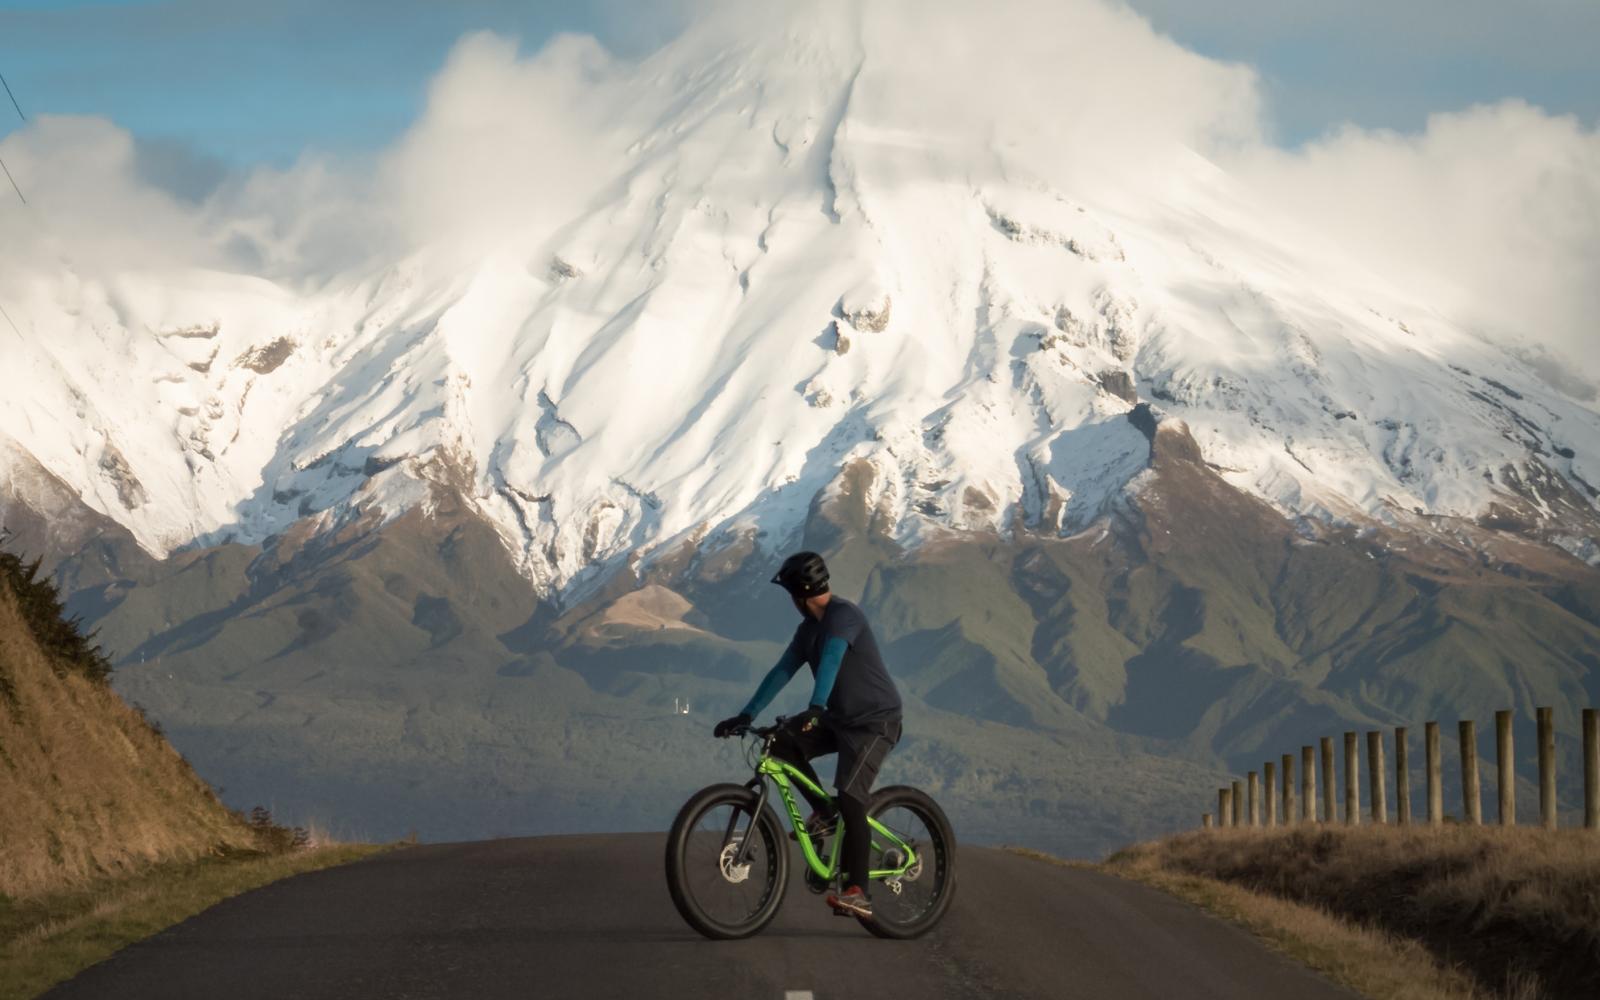 Copy of Copy of Lifestyle images 37 - Reid ® - Hercules Bike